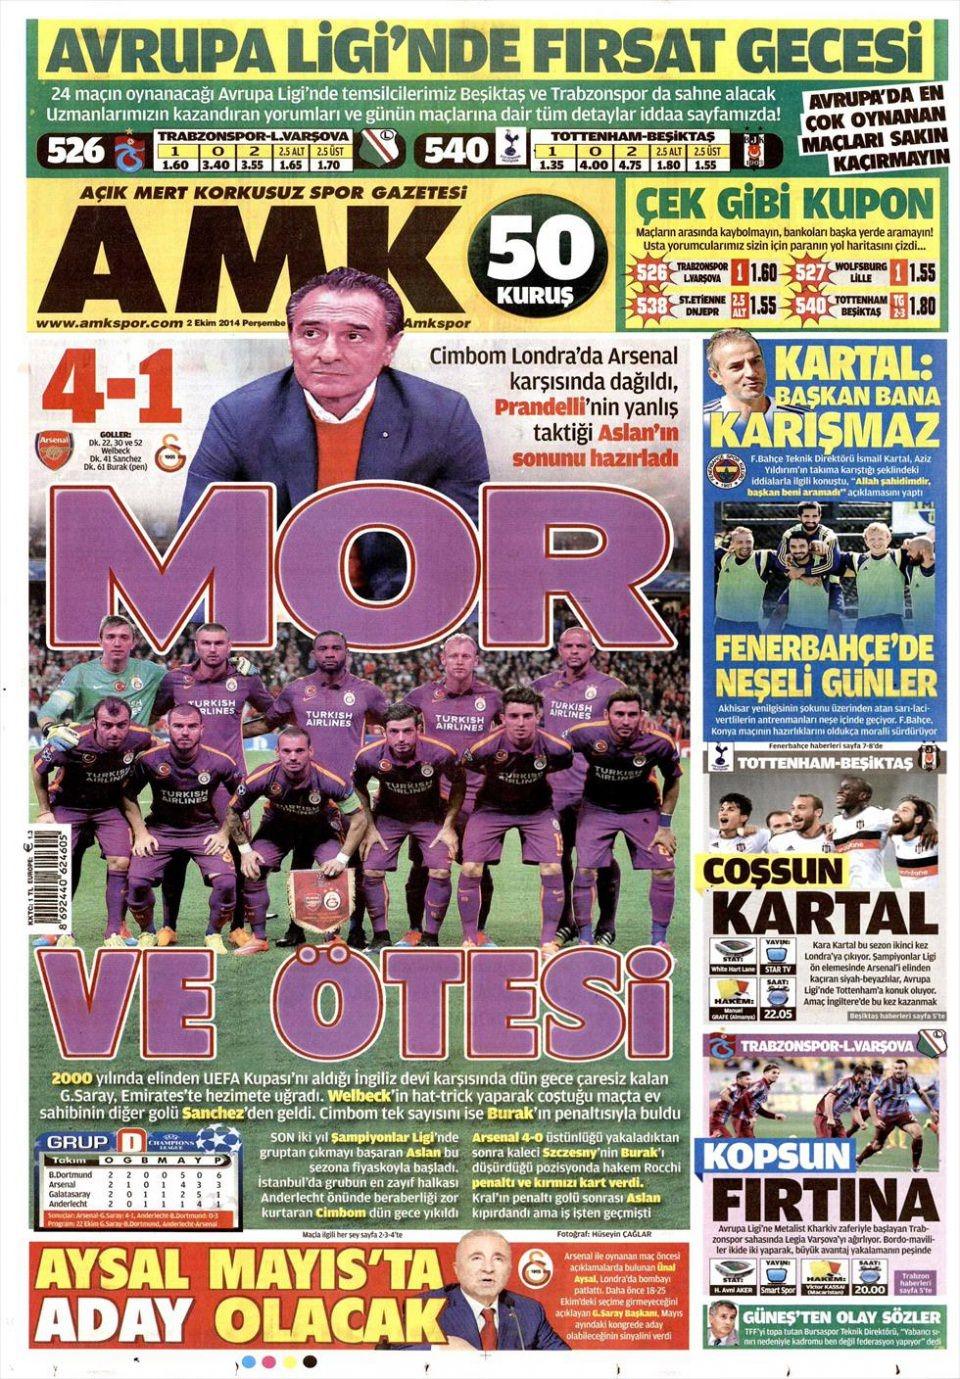 2 Ekim 2014 gazete manşetleri 2